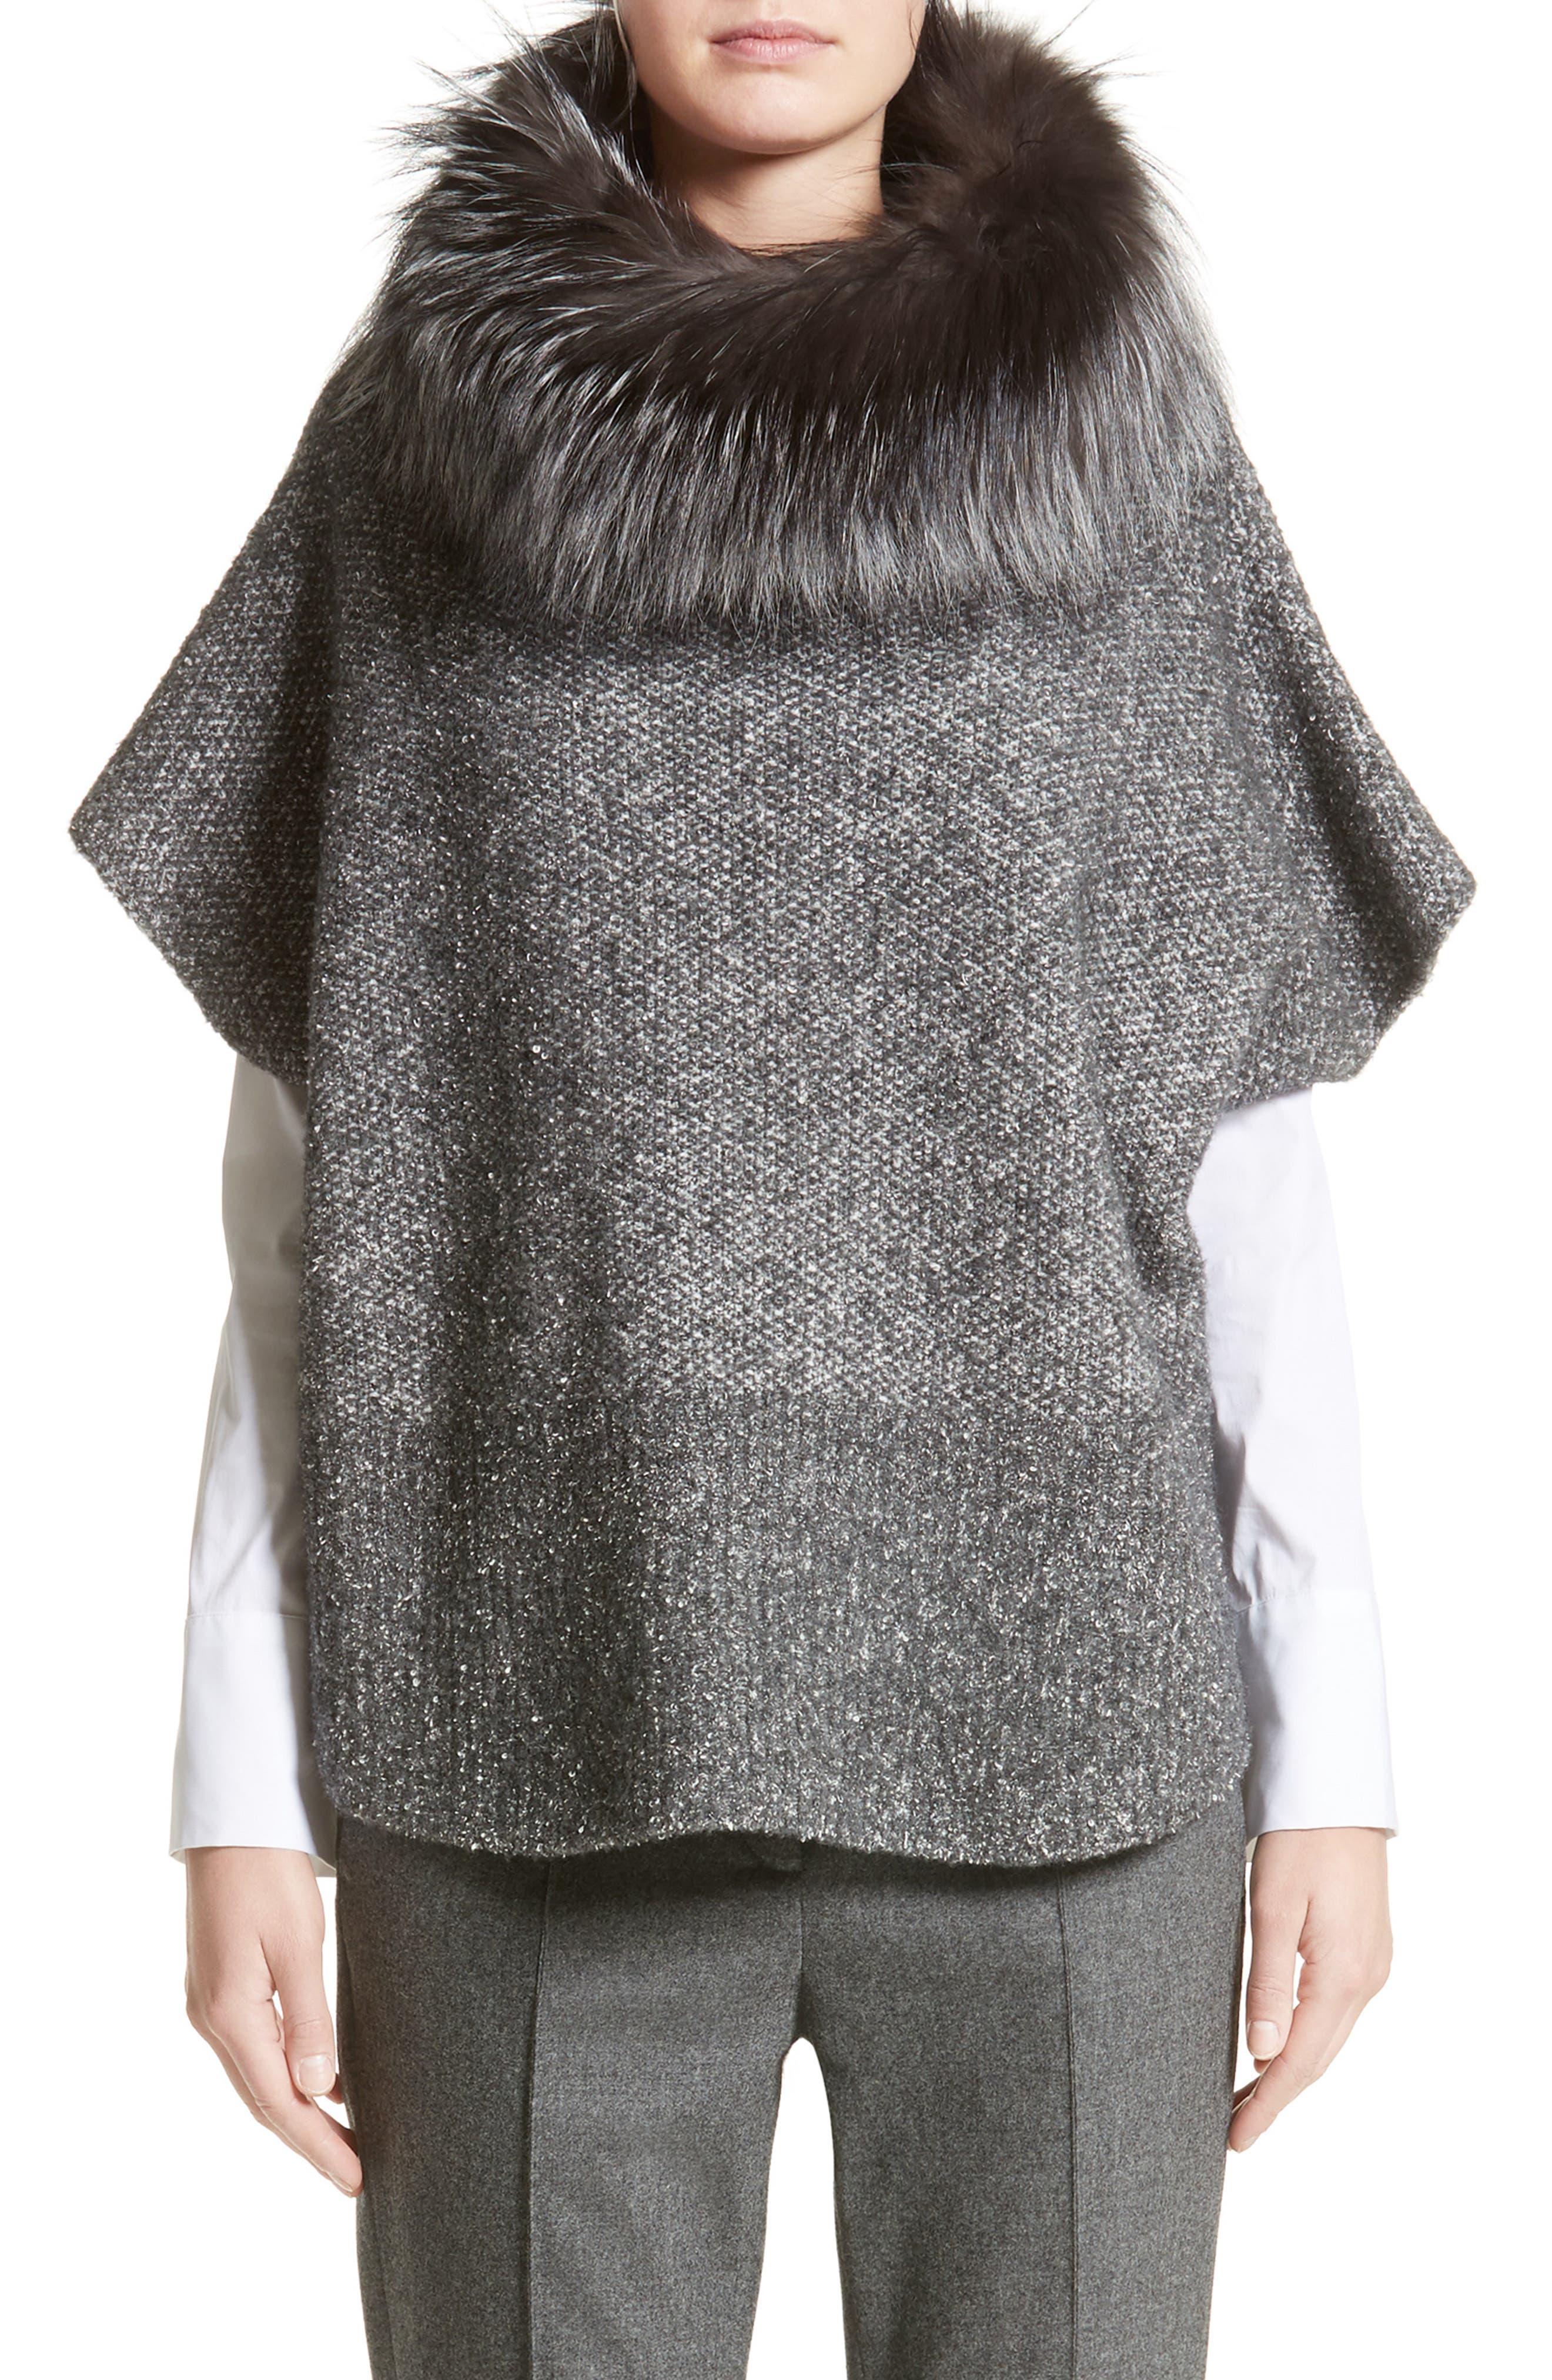 Pebble Tweed Knit Poncho with Genuine Fox Fur Collar,                         Main,                         color,